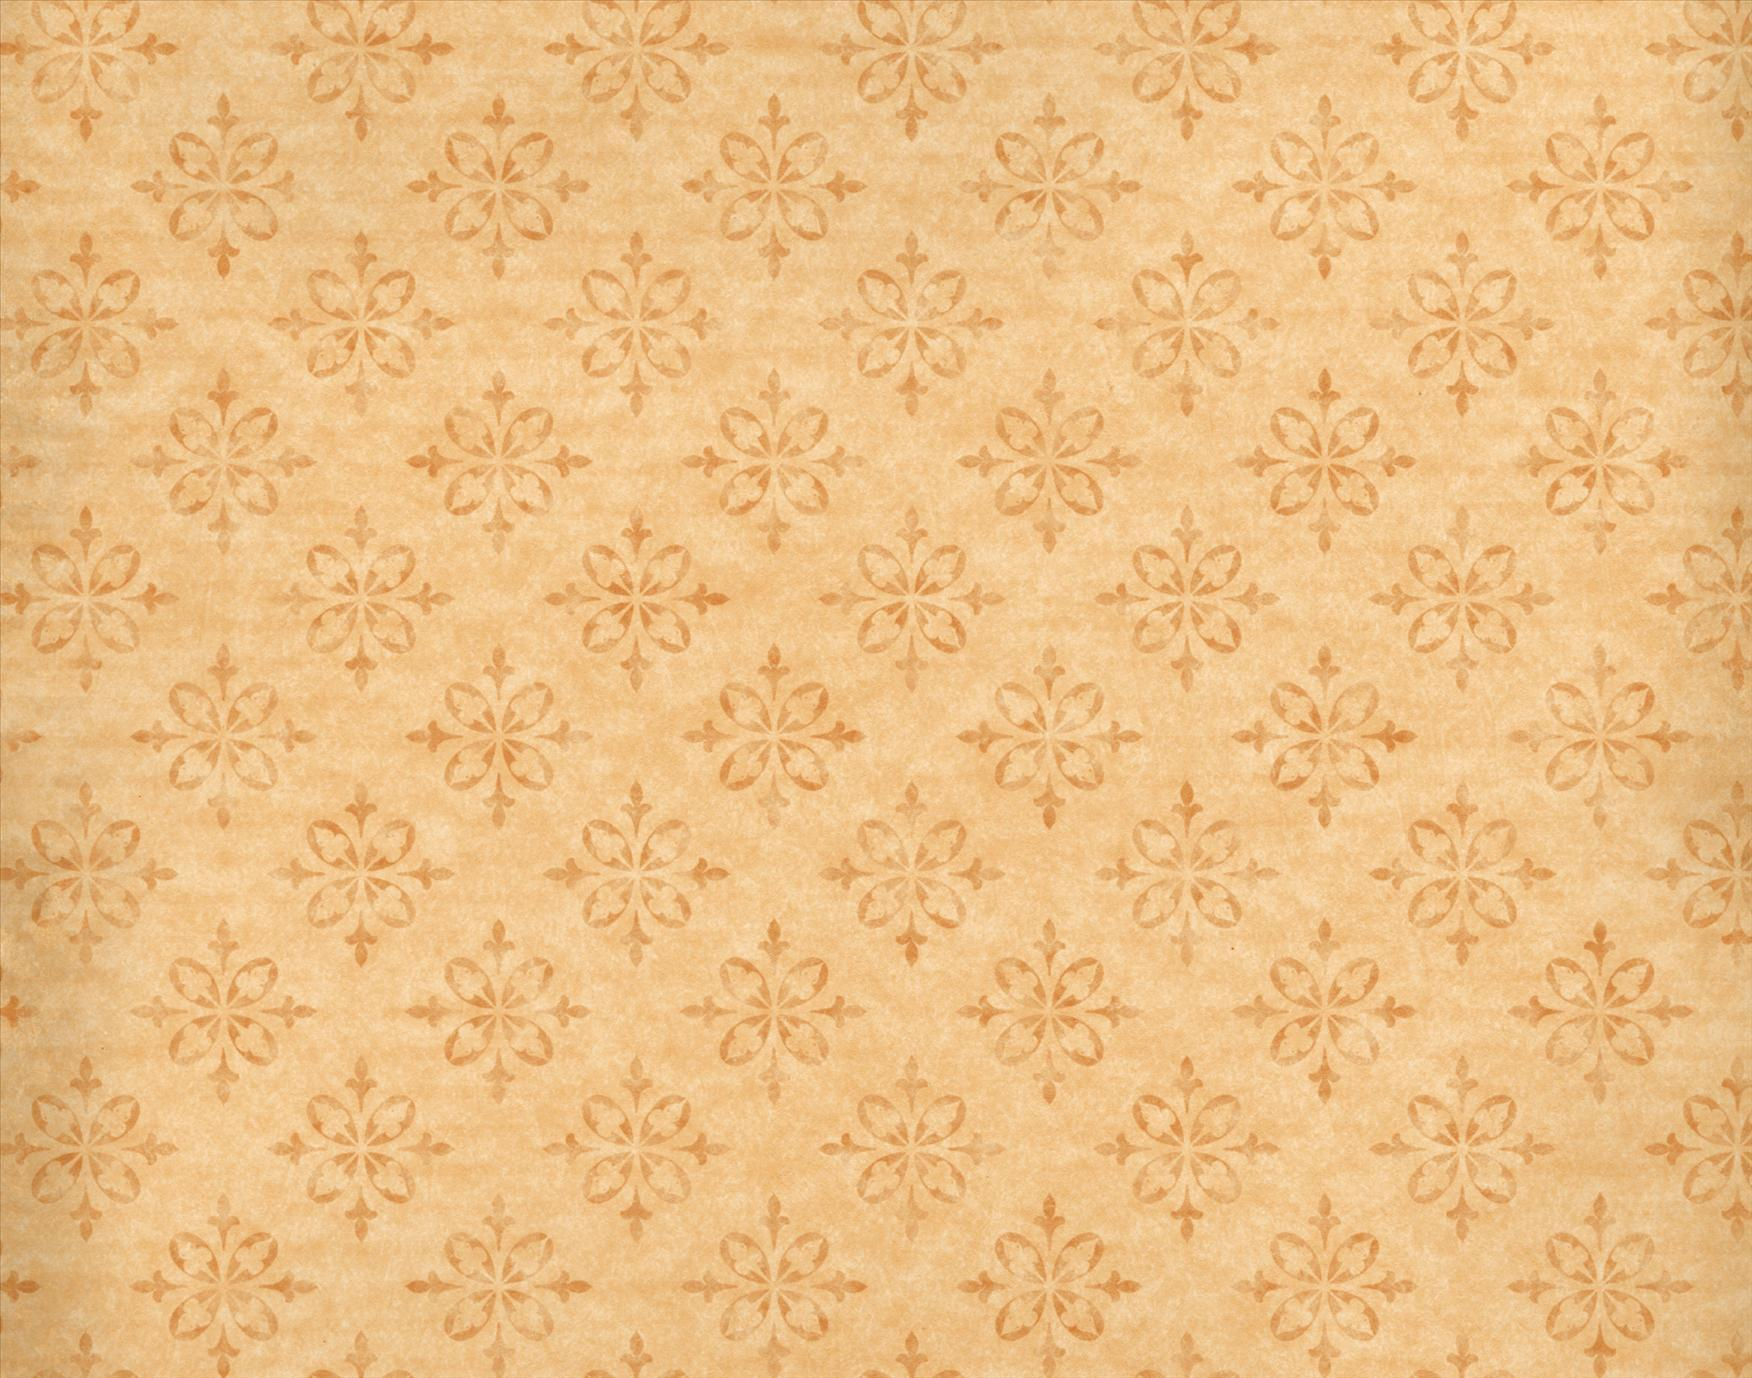 Free Vintage Wallpaper Backgrounds - Wallpaper Cave